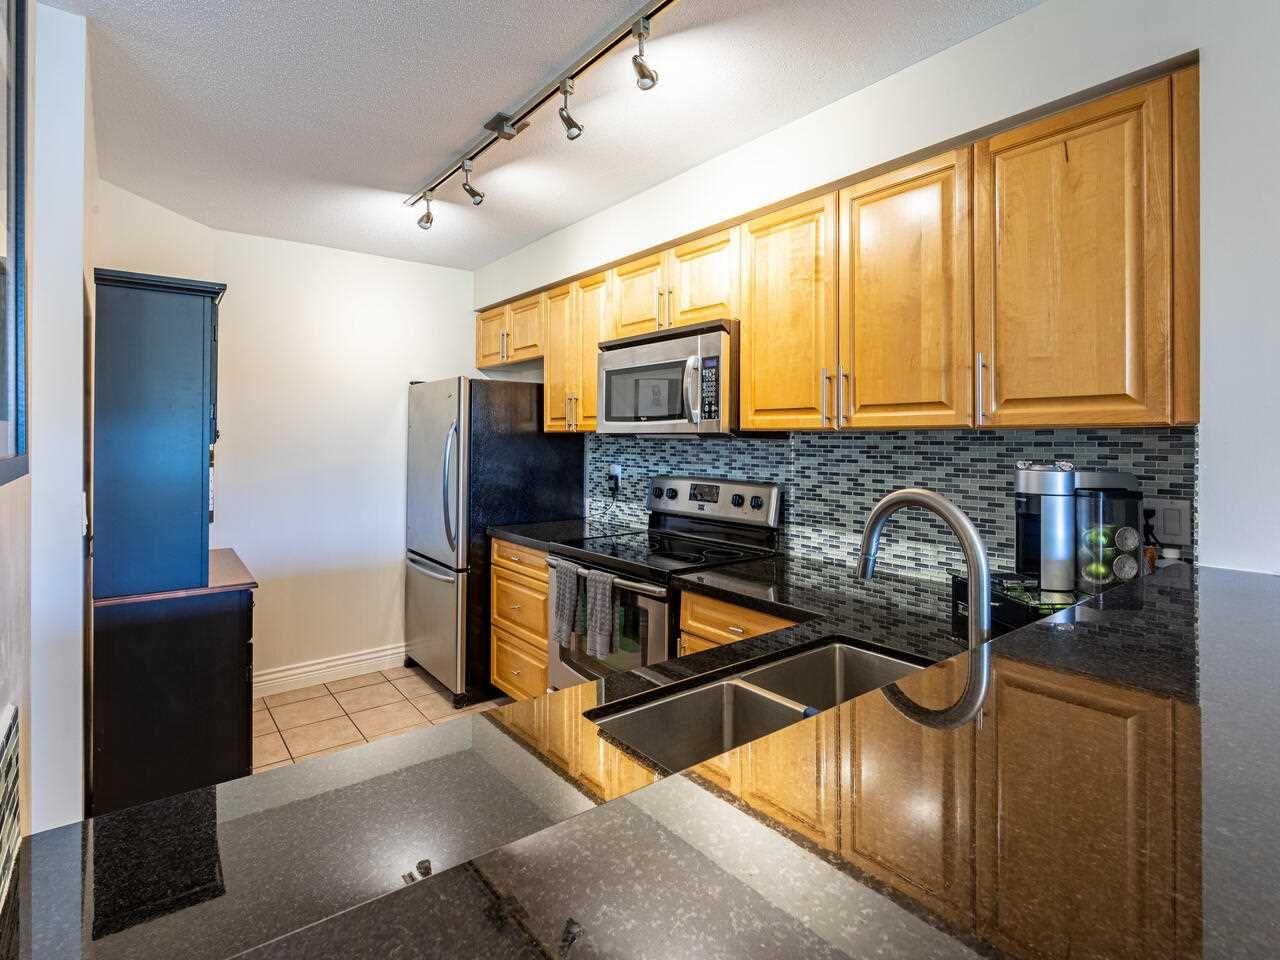 "Photo 8: Photos: 226 5800 ANDREWS Road in Richmond: Steveston South Condo for sale in ""THE VILLAS"" : MLS®# R2569641"